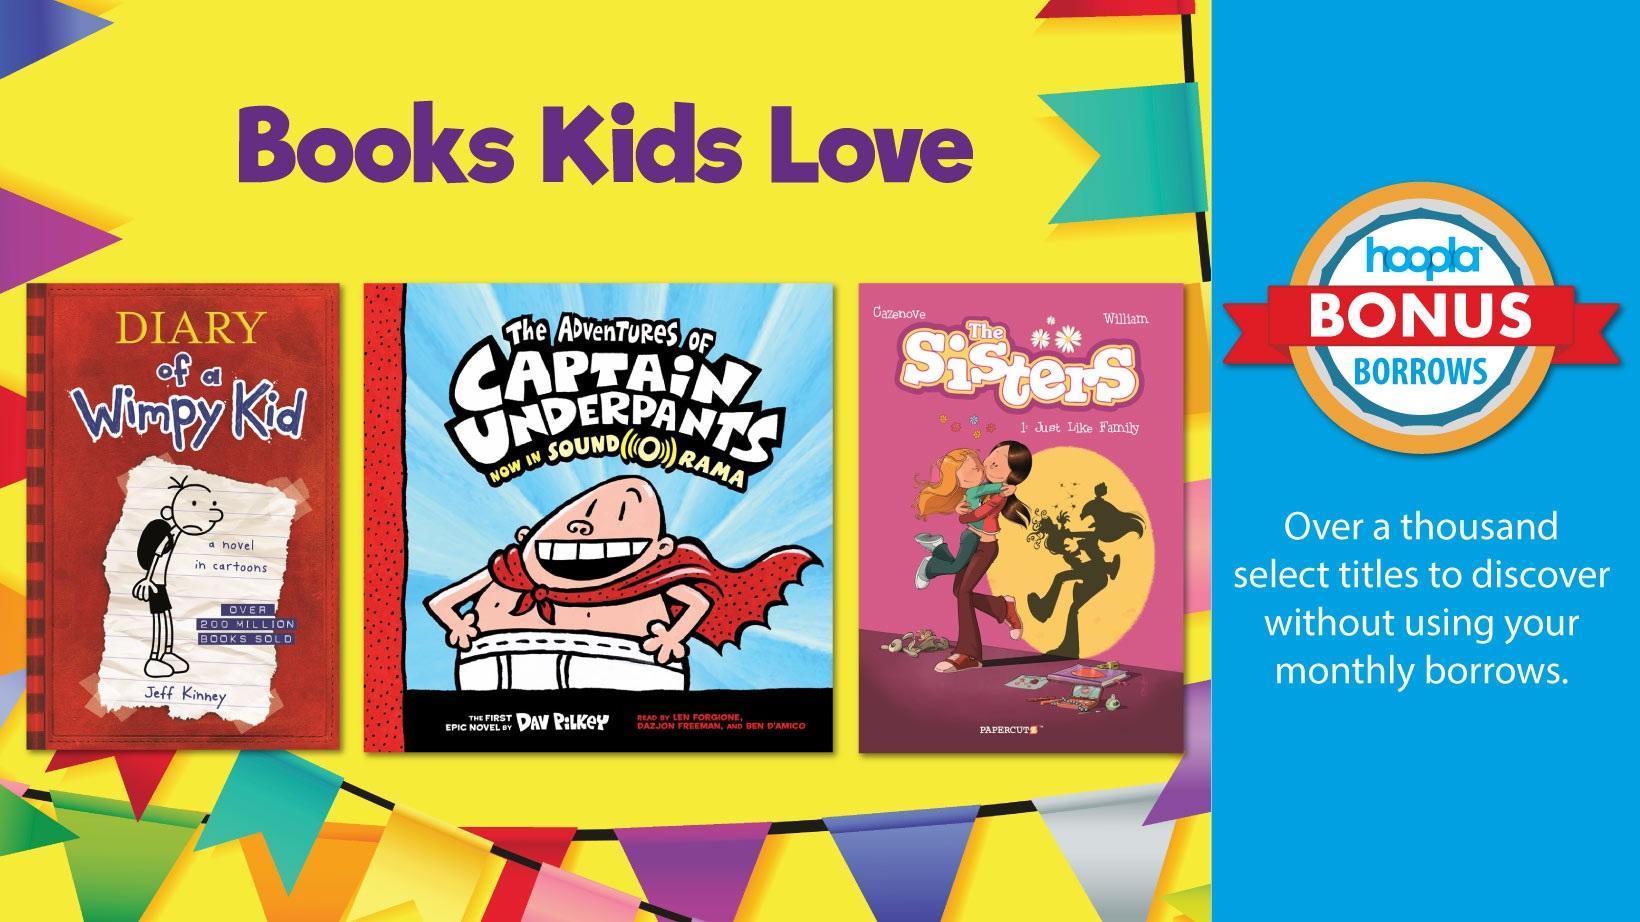 Hoopla Bonus Borrows Collection for Kids